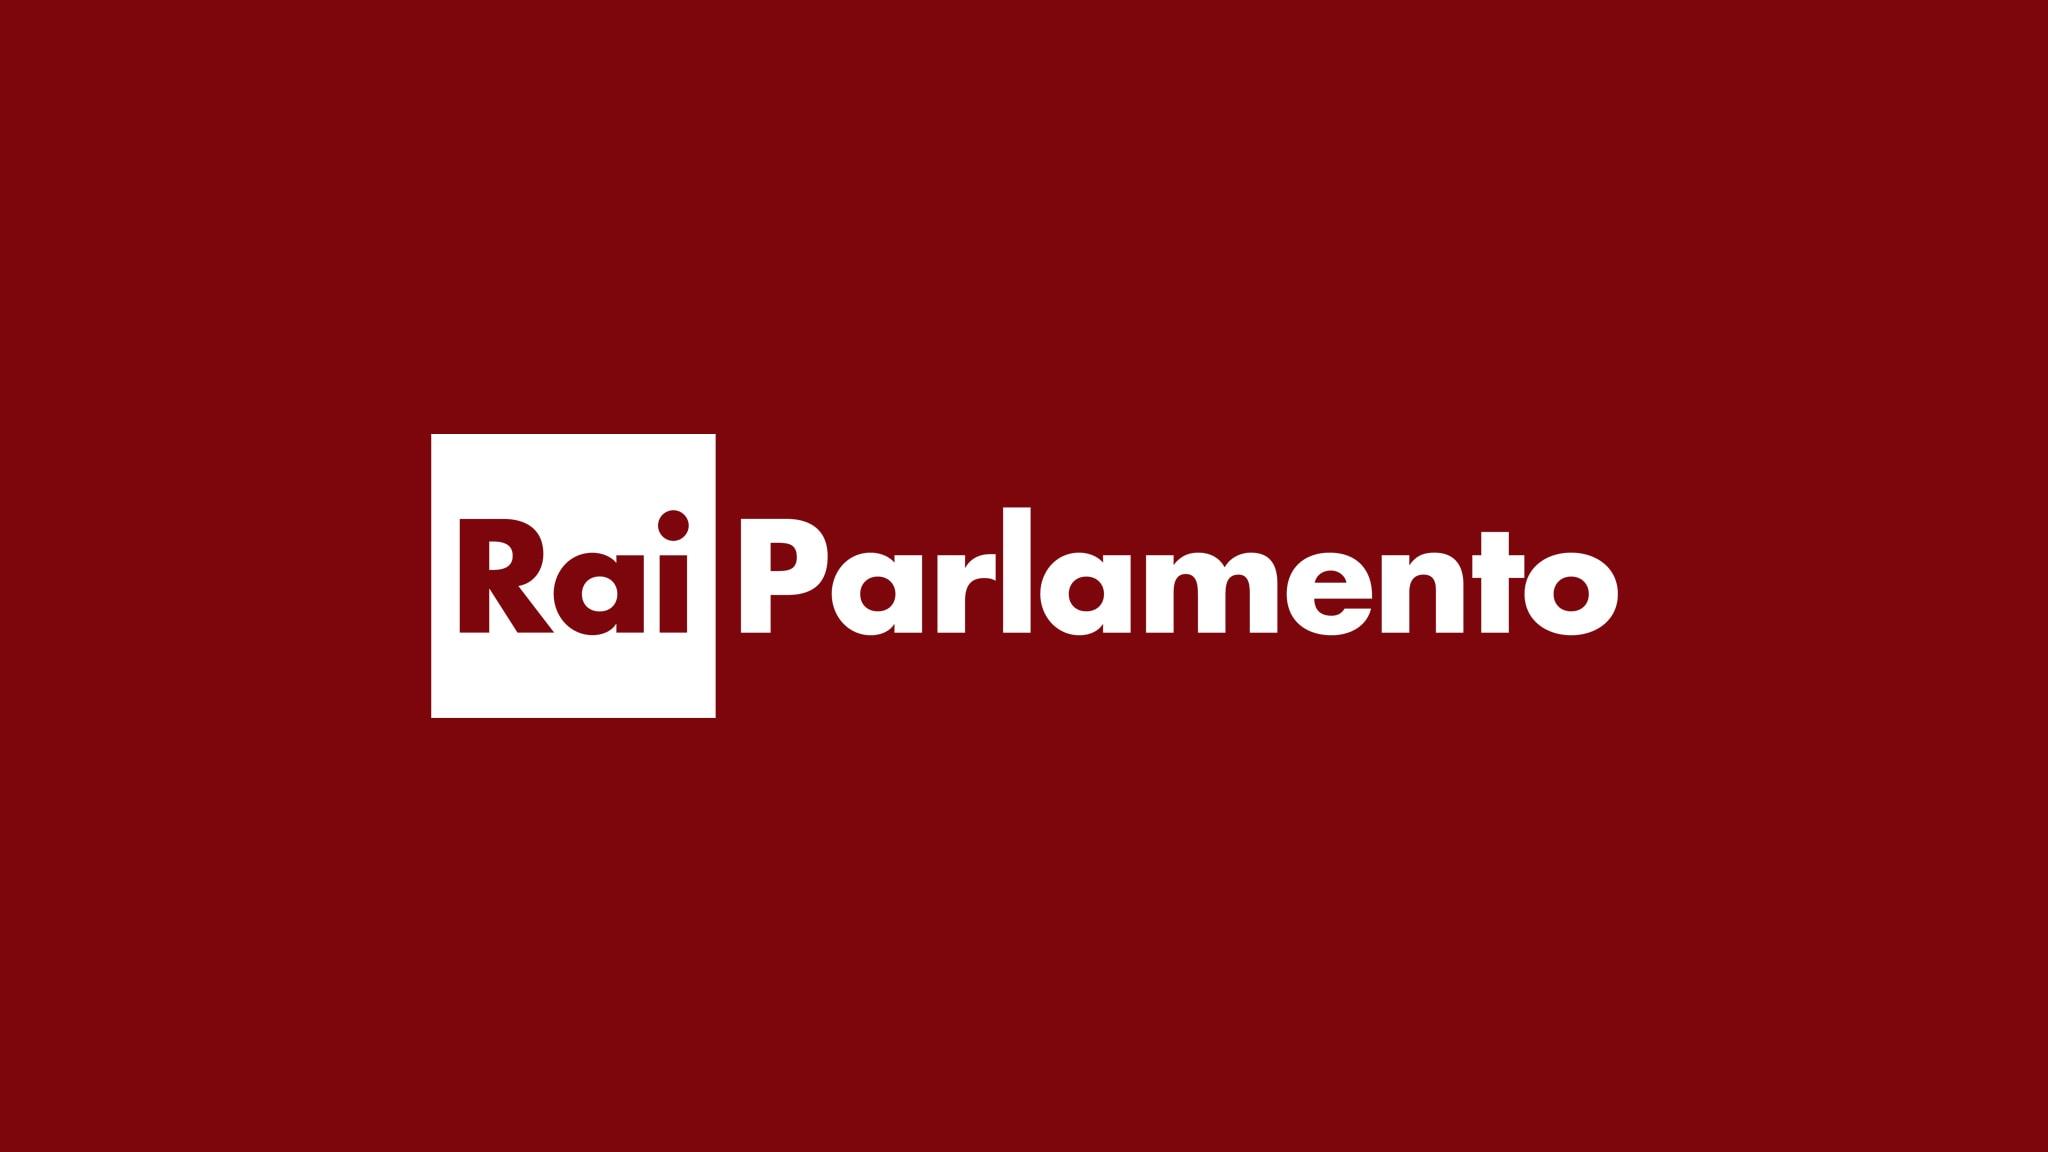 Rai 3 Messaggi Autogestiti - Referendum 2020